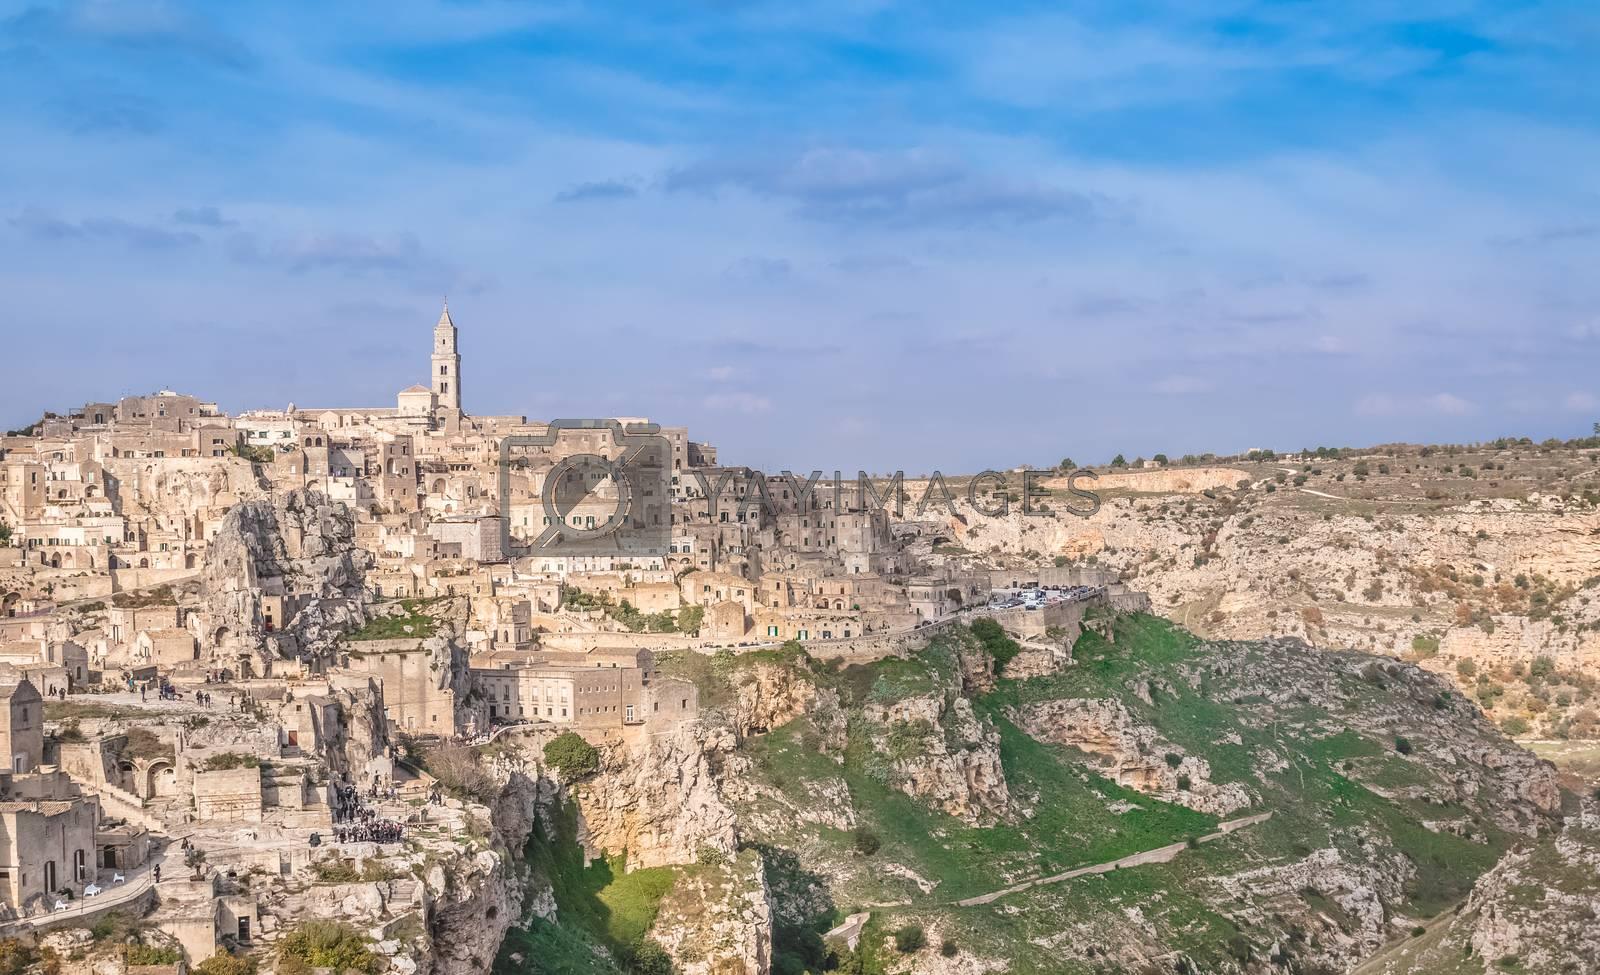 panoramic view of typical stones (Sassi di Matera) and church near gravina of Matera UNESCO European Capital of Culture 2019 on blue sky. Basilicata, Italy